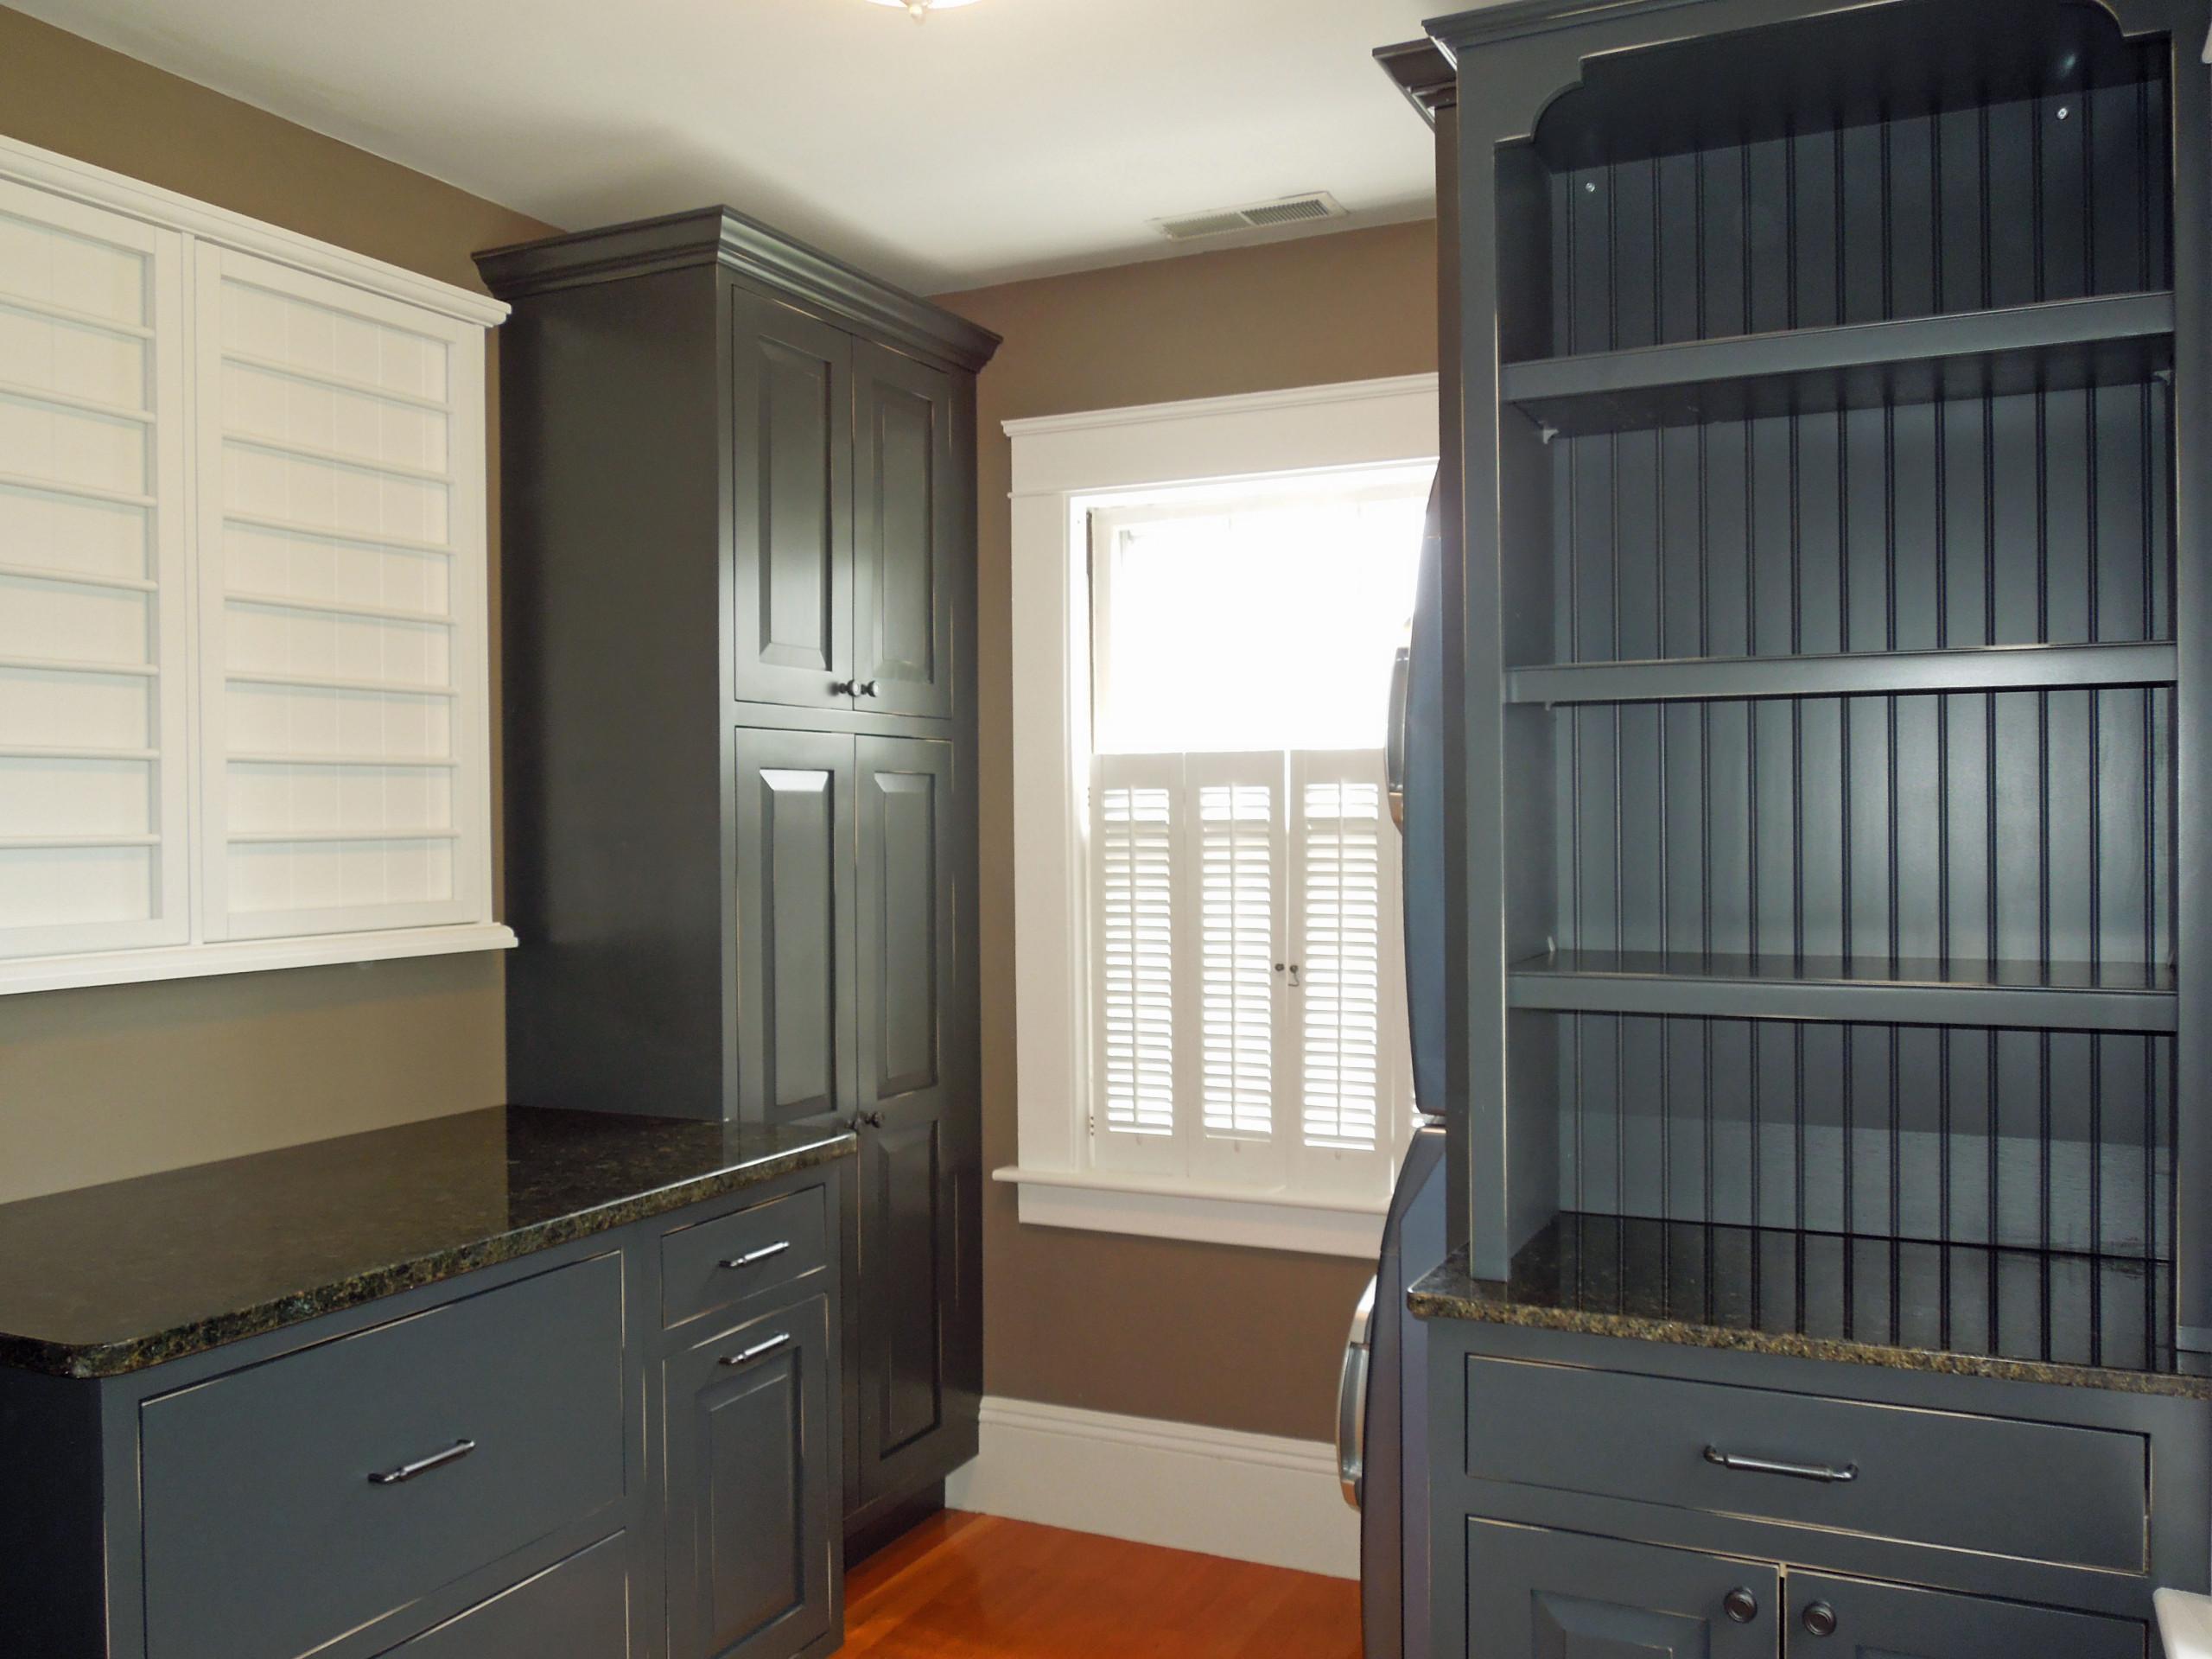 Second Floor Dream Laundry Room